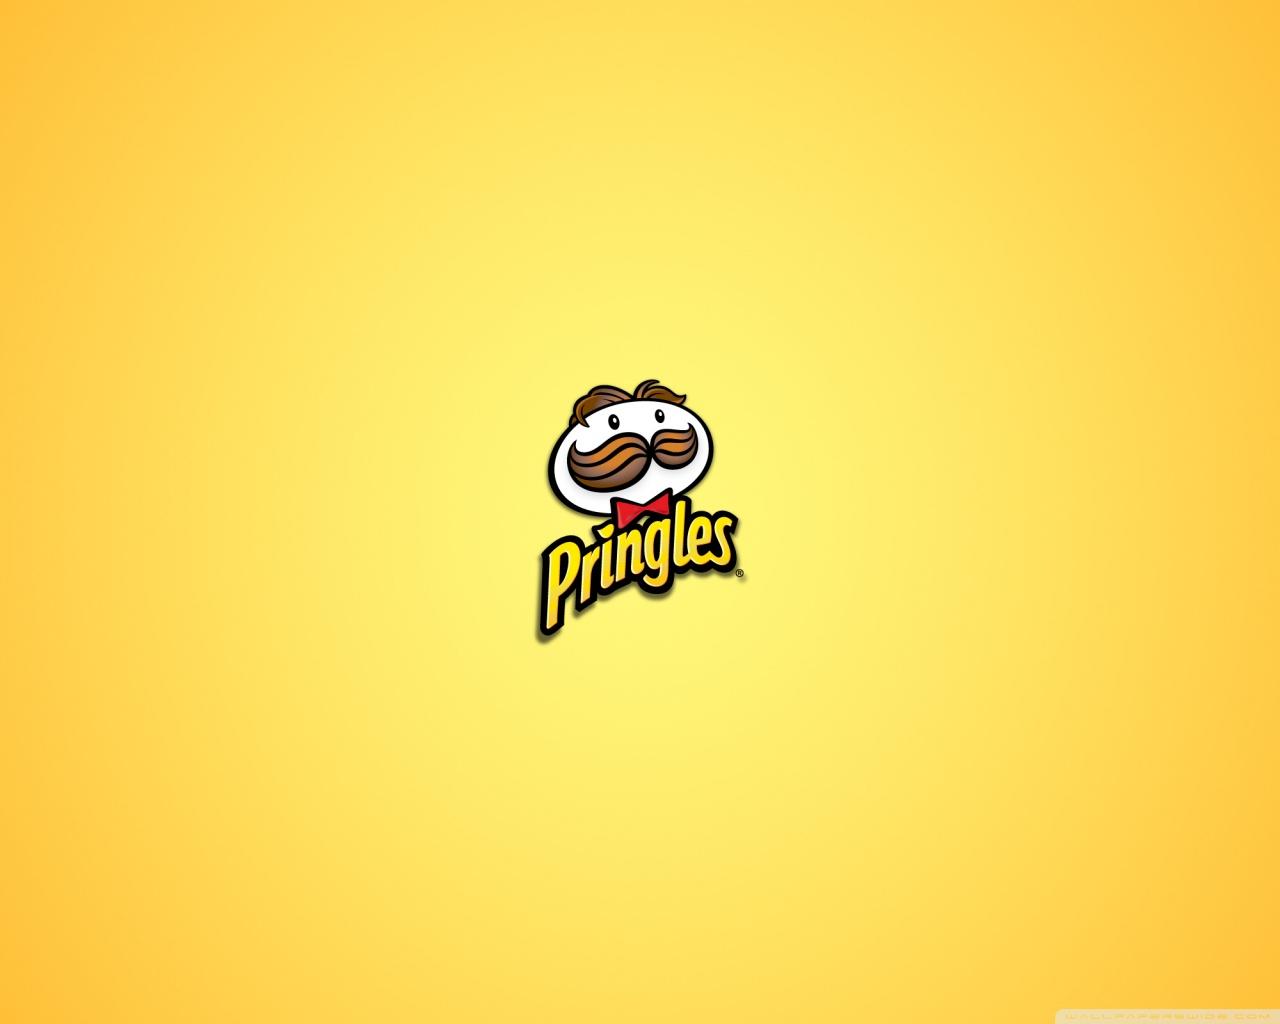 Pringles Guy 4K HD Desktop Wallpaper for 4K Ultra HD TV Dual 1280x1024